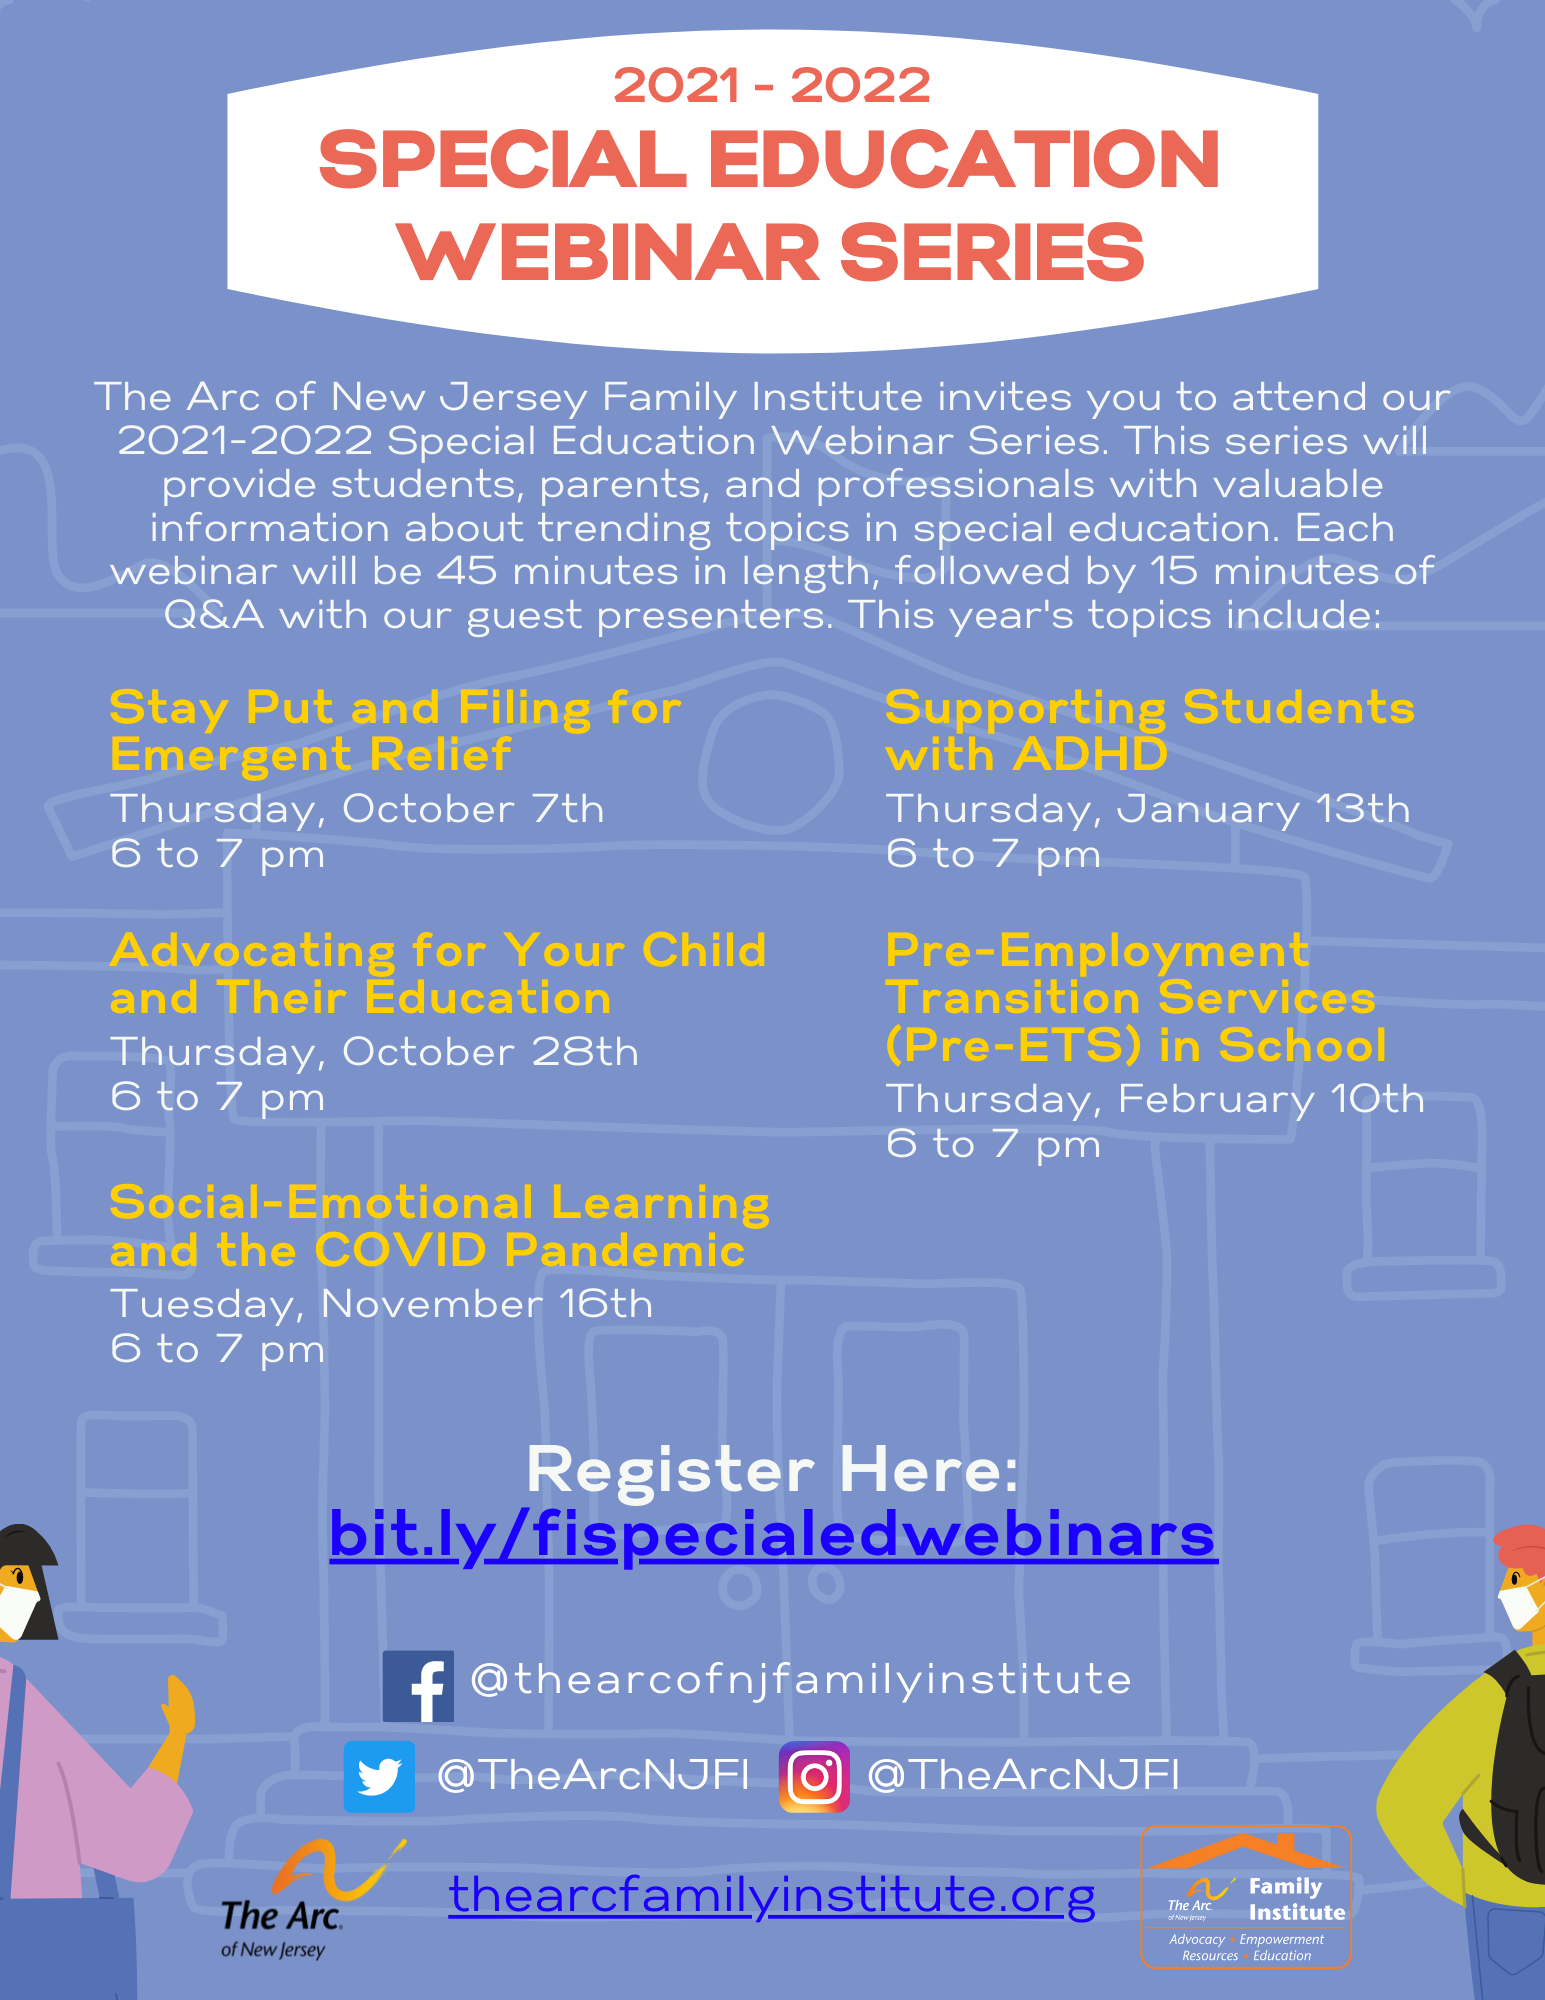 Special Education Webinar Series